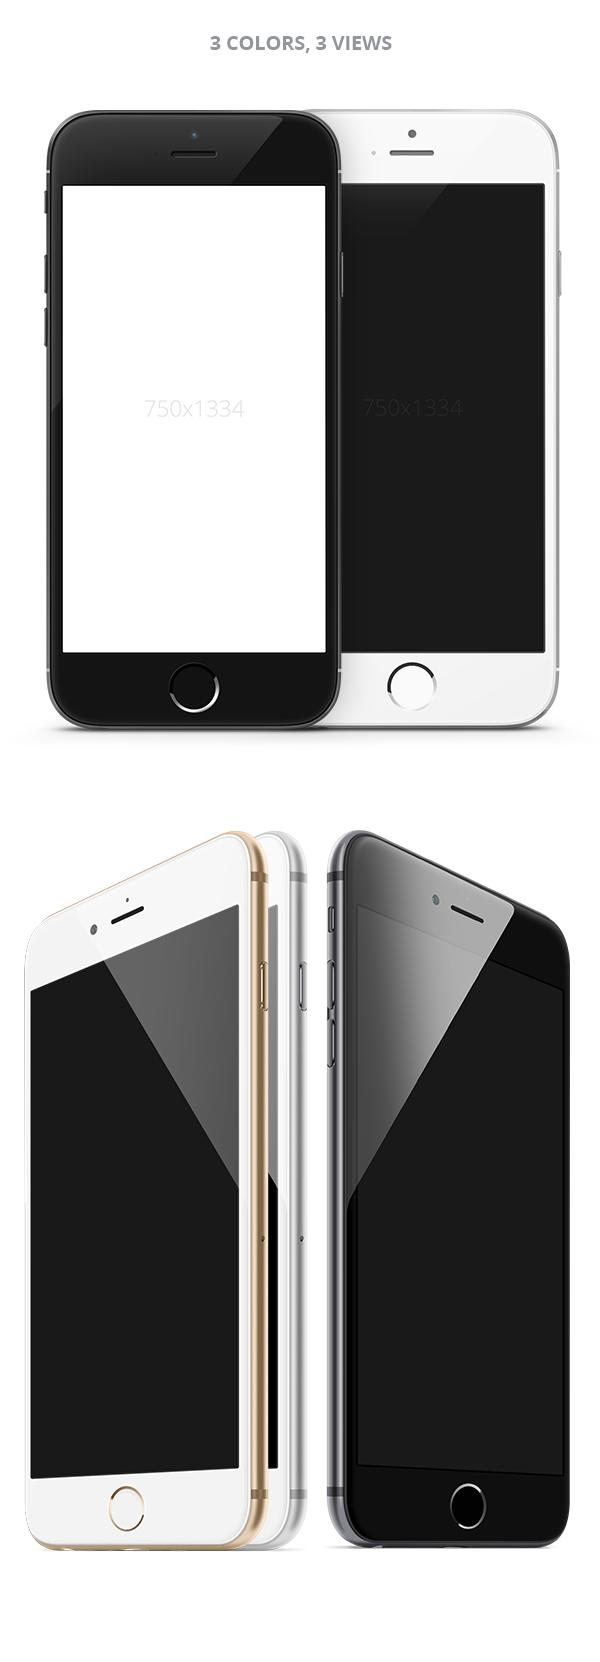 iPhone 6 PSD und Sketch Template